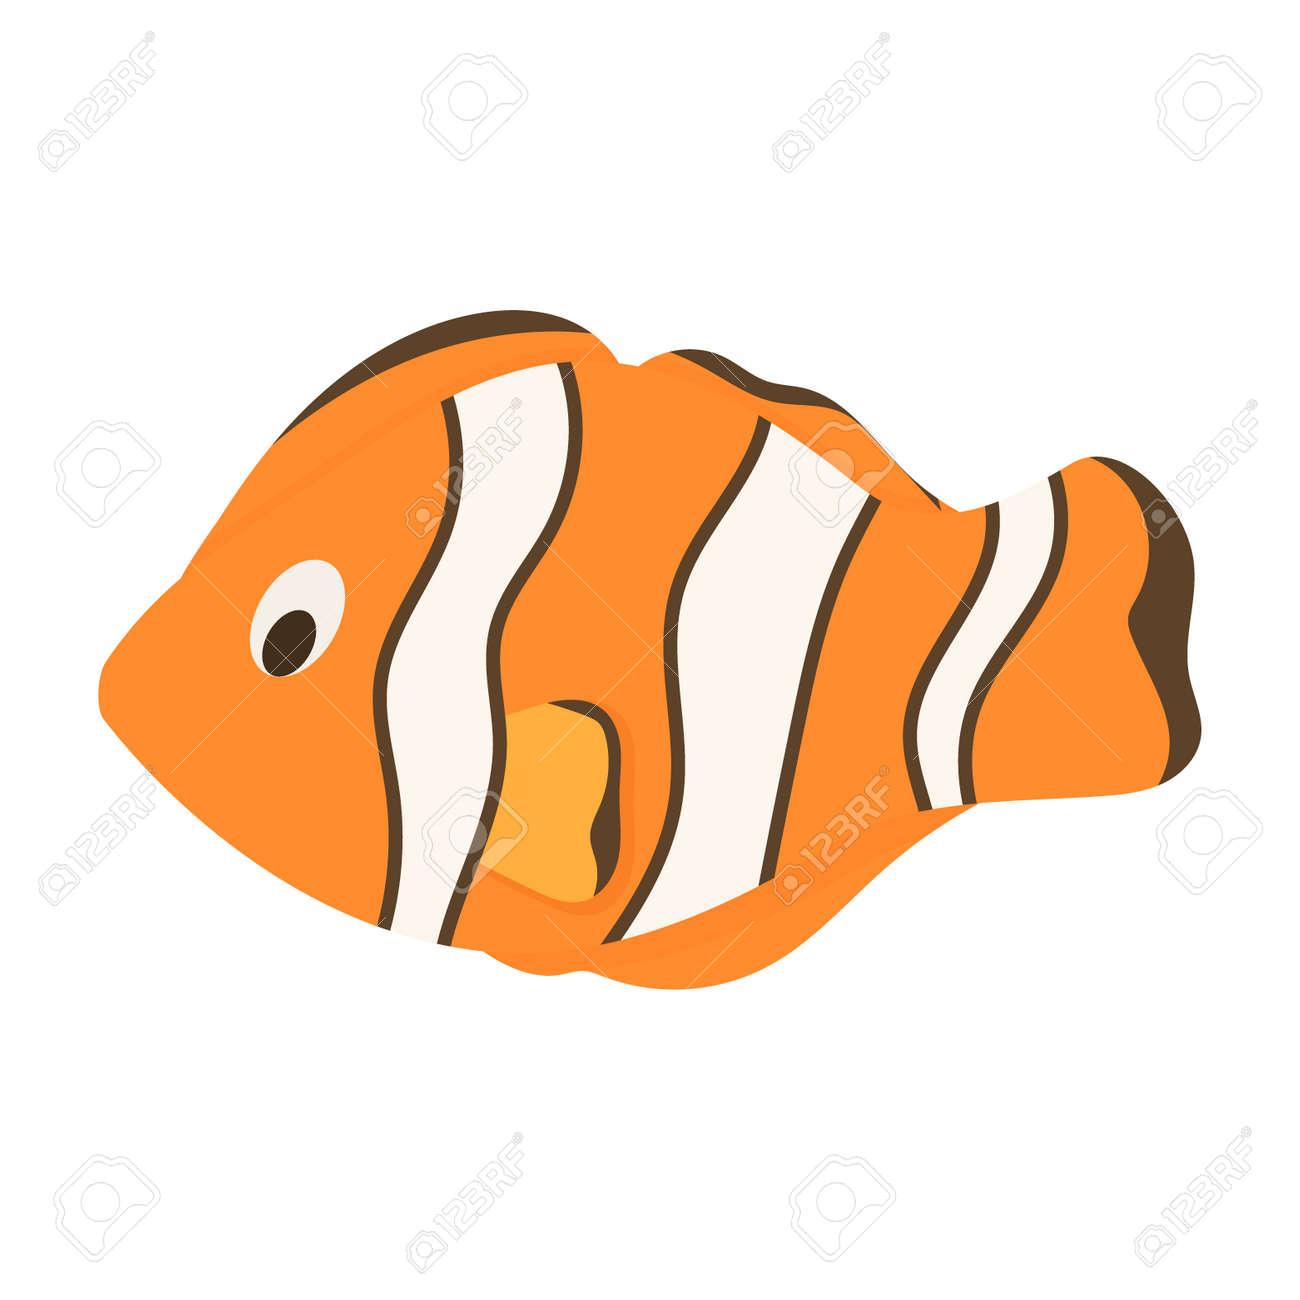 hight resolution of nemo fish clownfish marine anemone sea animal vector illustration underwater ocean clown orange fish